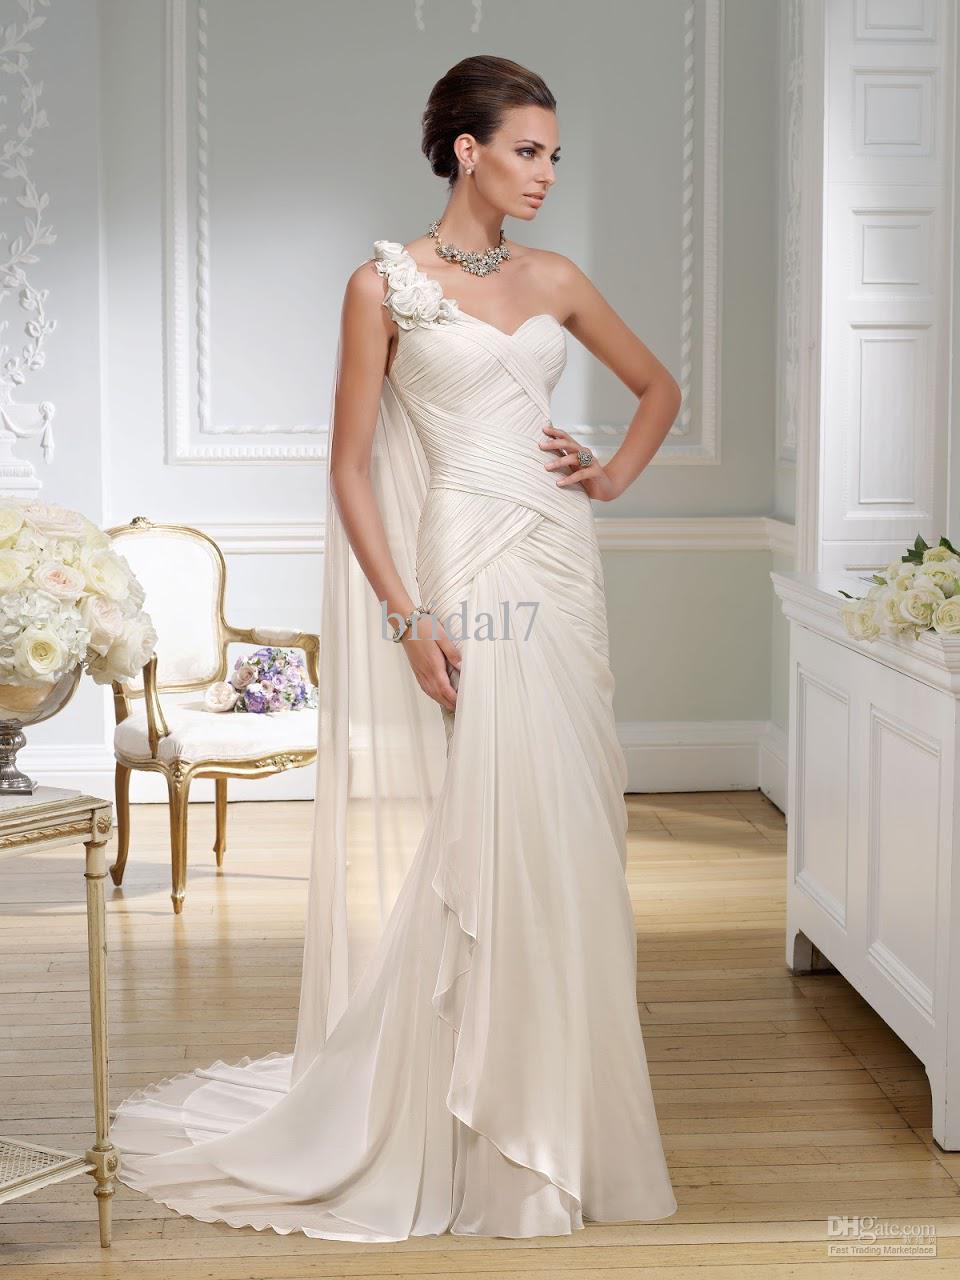 greek goddess wedding dress style grecian wedding dress Grecian Style Bridesmaid Dresses Australia Dress And Bottoms